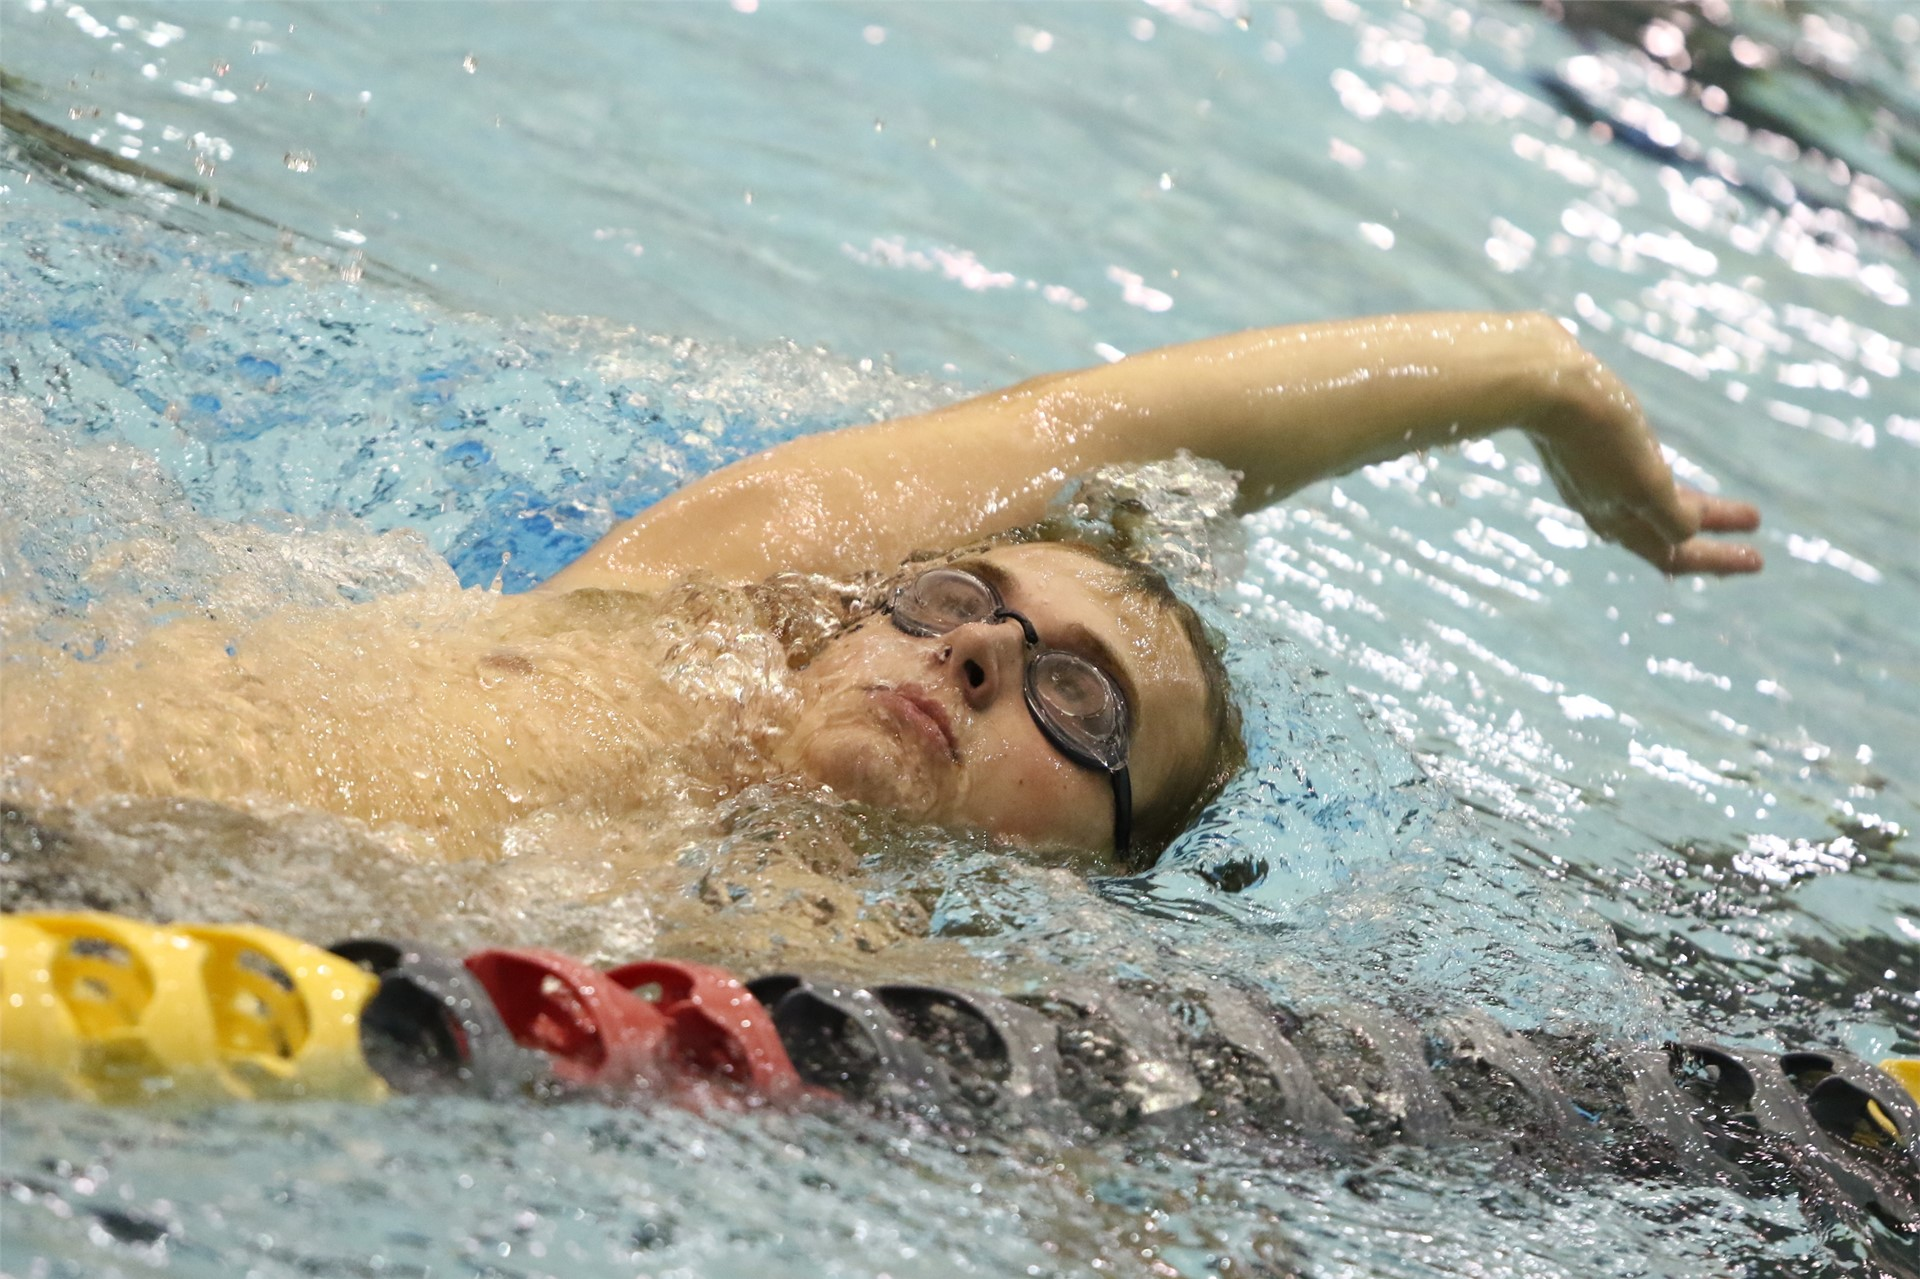 PHS student athlete swimming